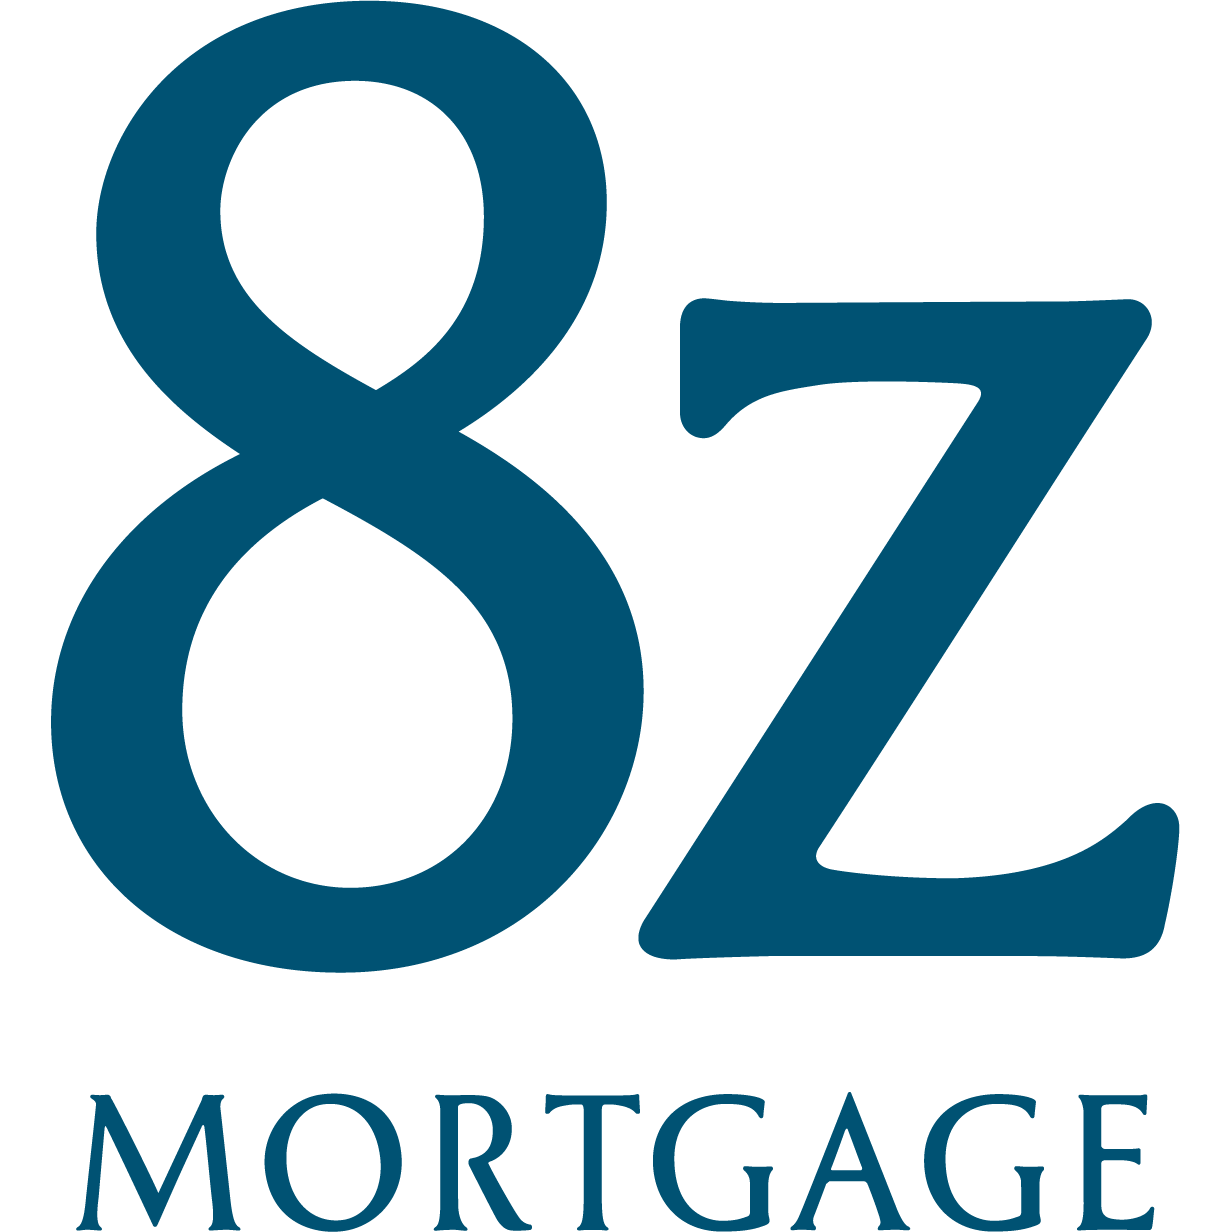 8Z Mortgage, Tim Rhey, NMLS #883312 - Greenwood Village, CO 80111 - (480)206-7678 | ShowMeLocal.com